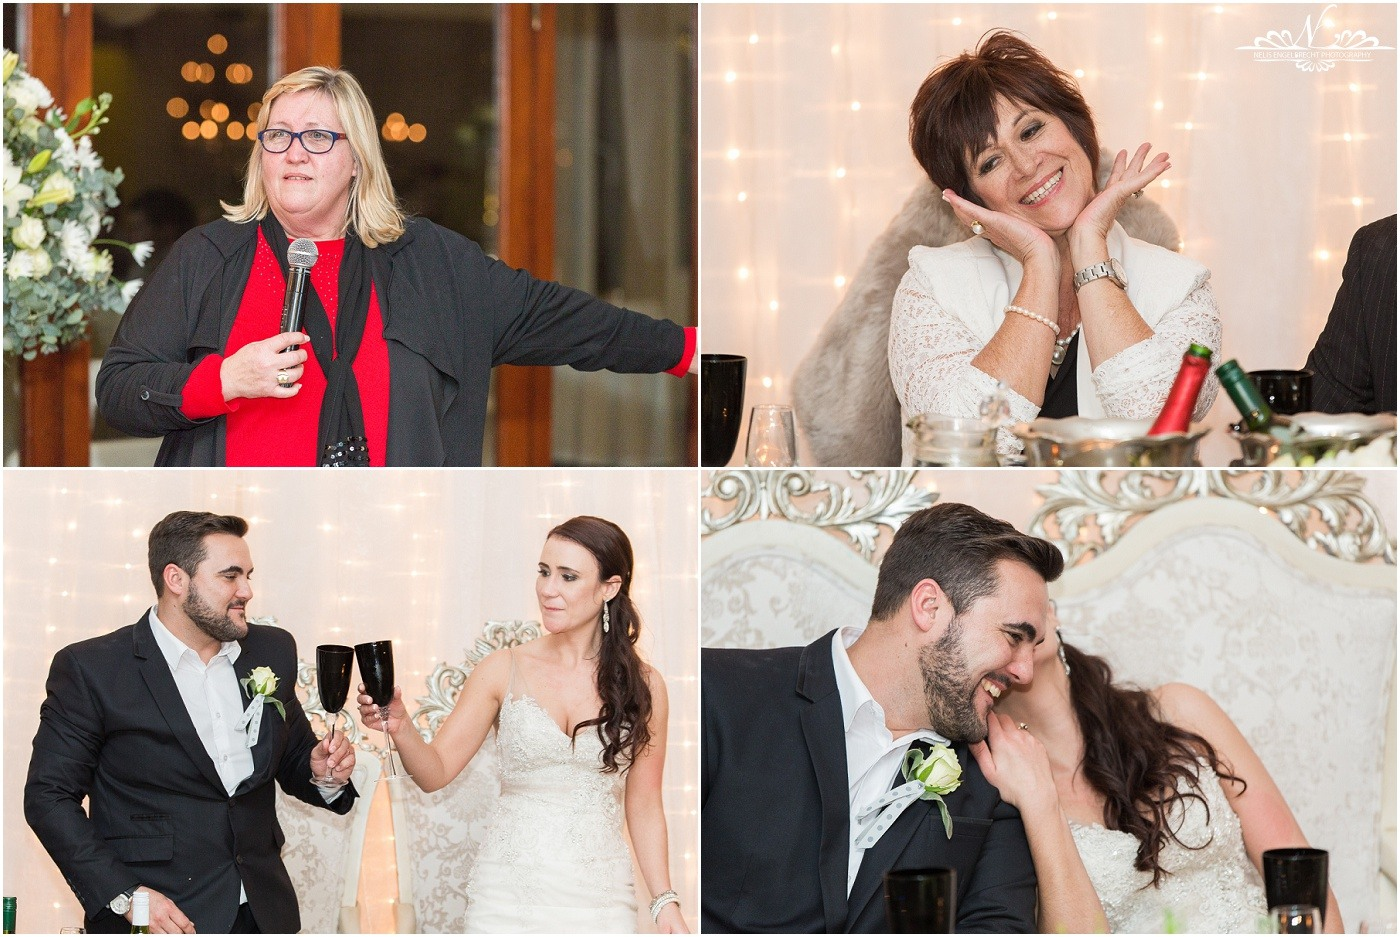 Eensgezind-Wedding-Photos-Nelis-Engelbrecht-Photography-178